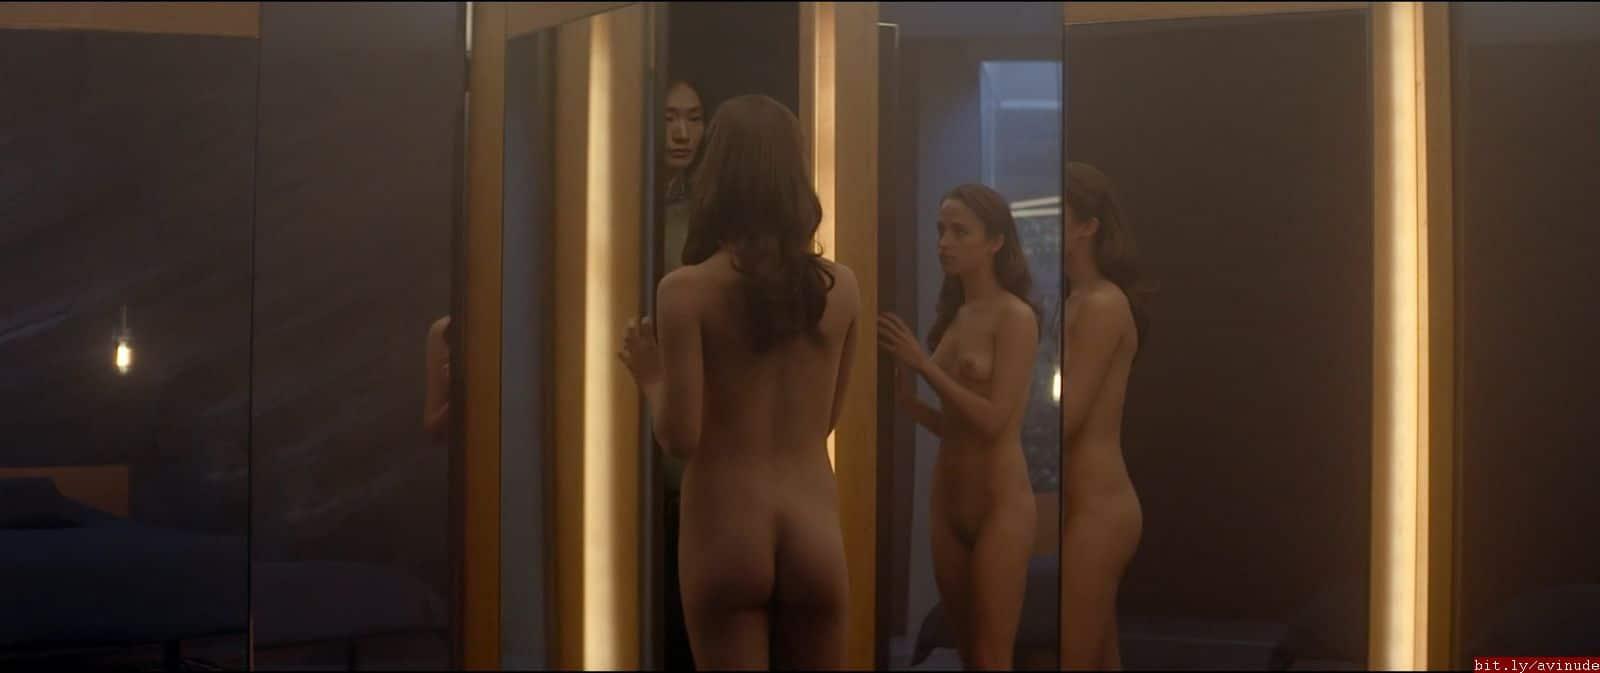 Alicia_Vikander's Porn alicia vikander nude kronjuvelerna hd - alicia vikander